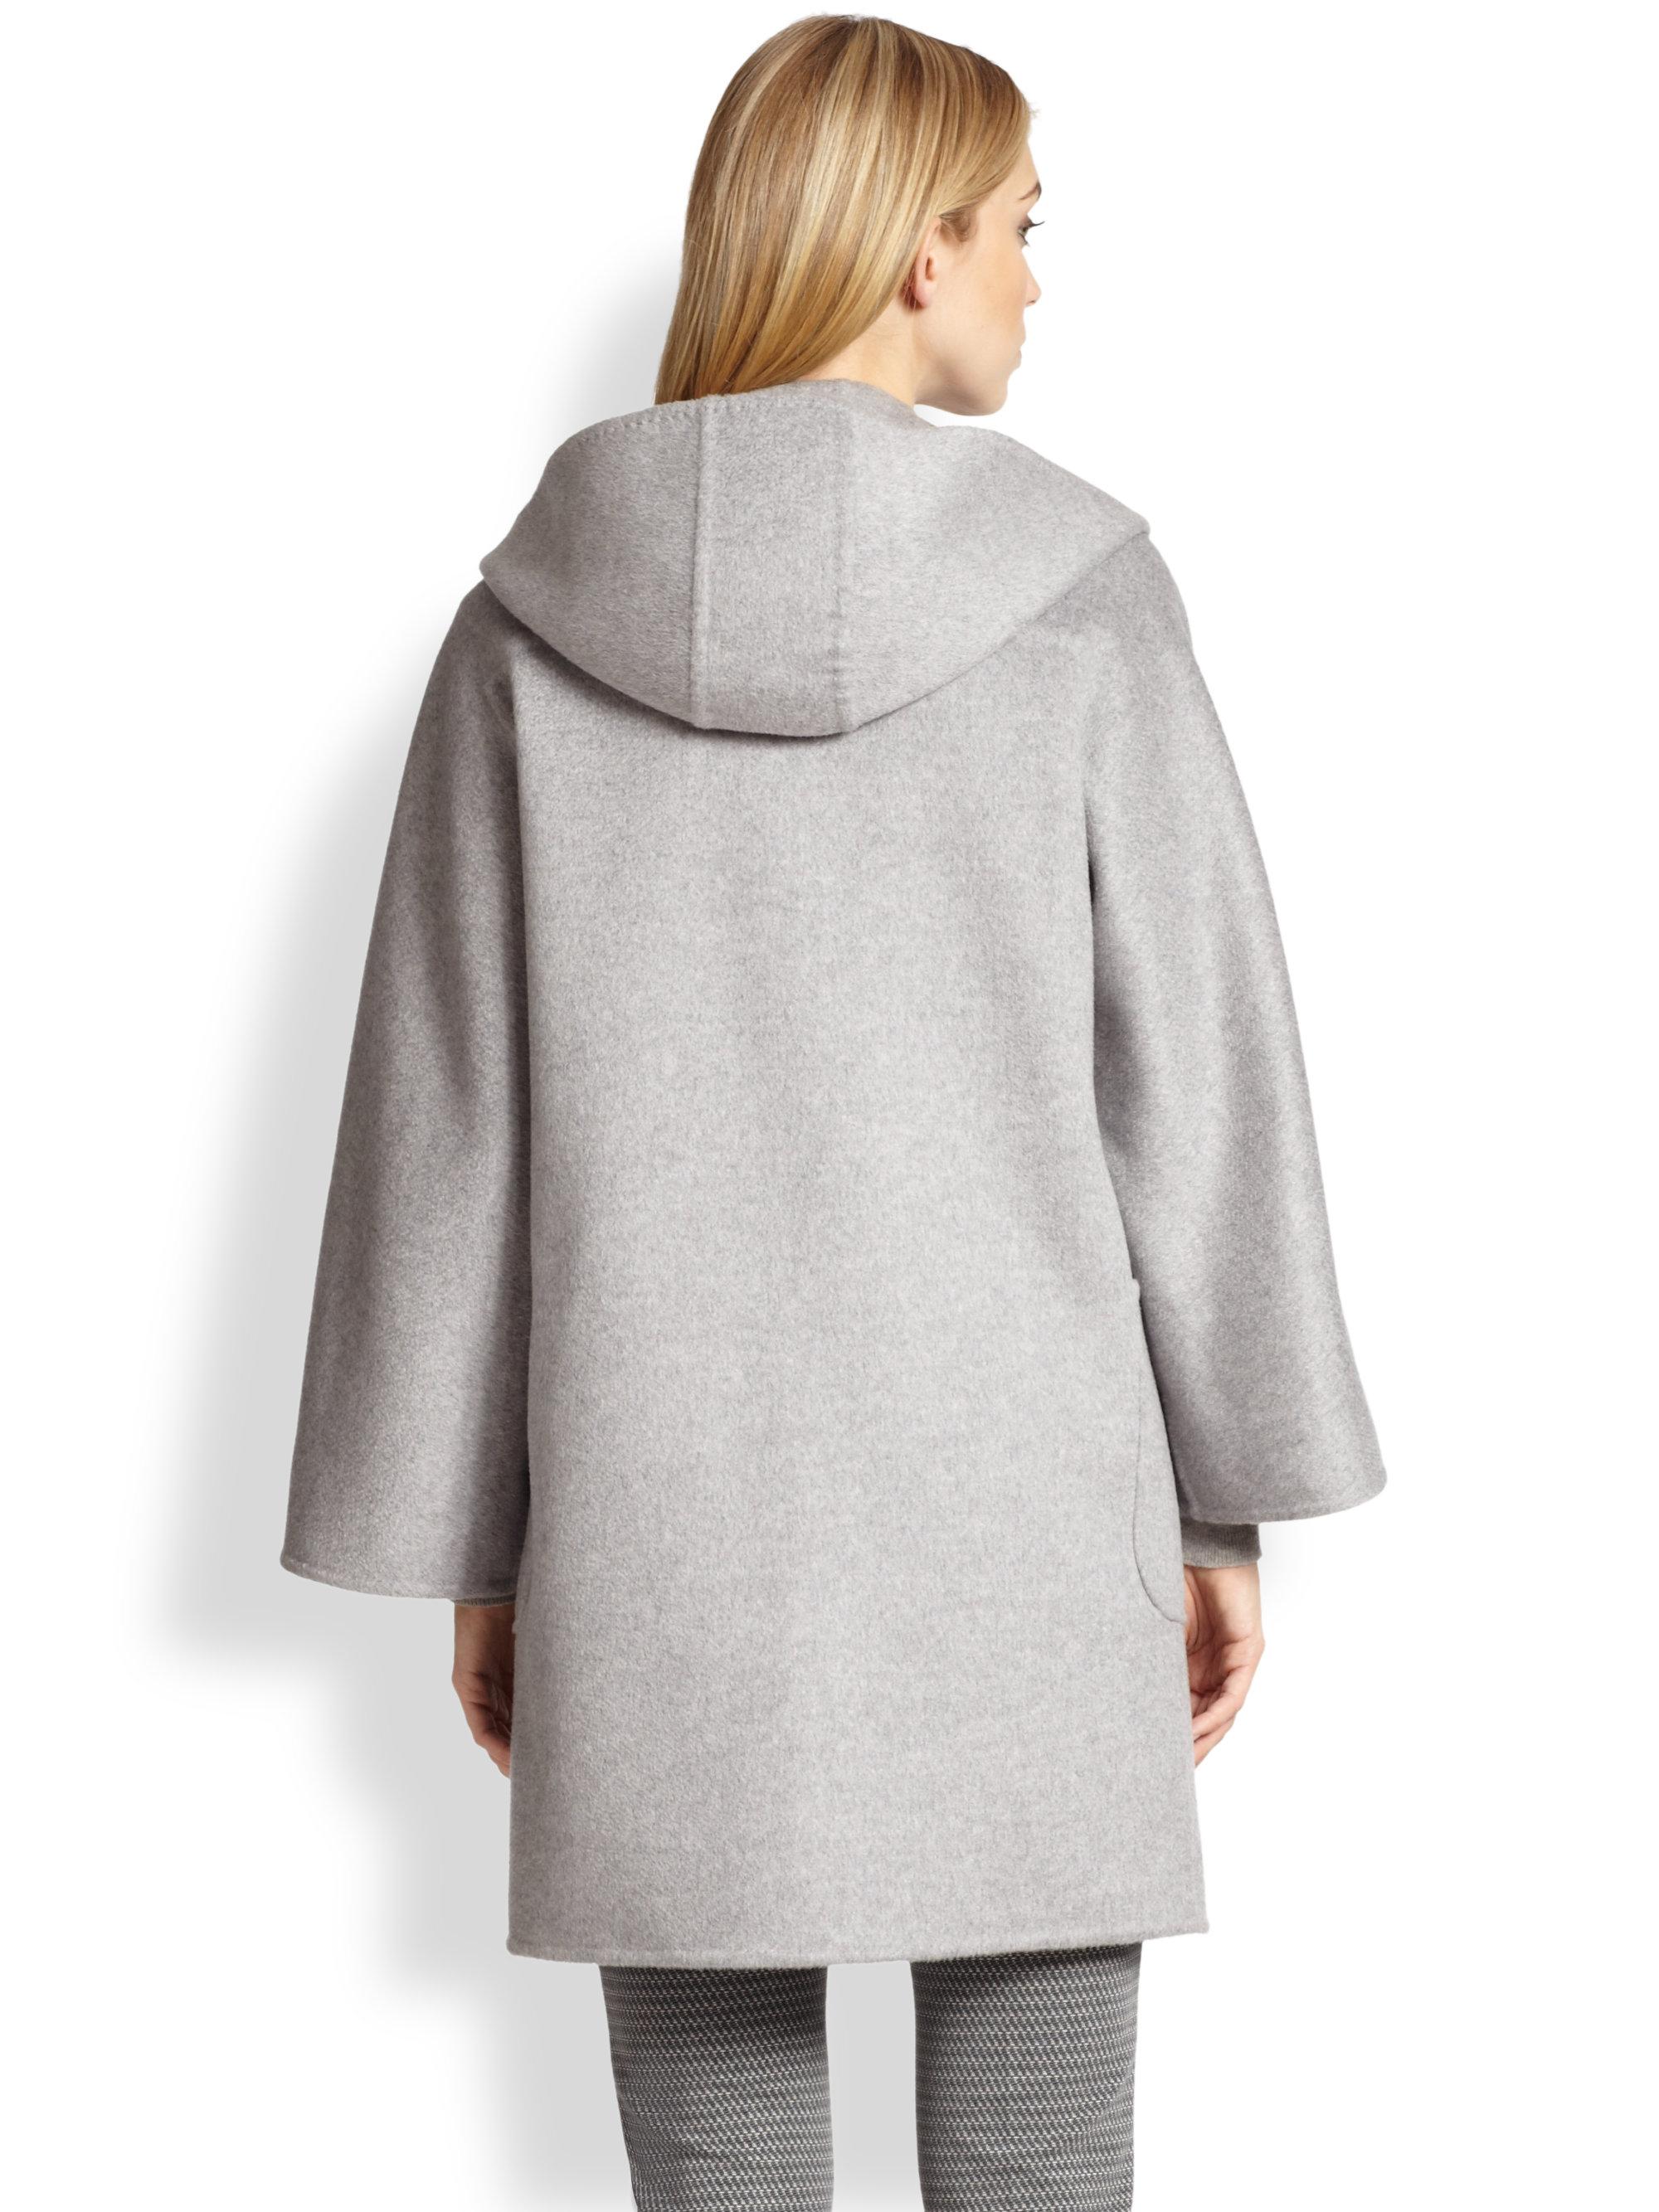 Max mara Avorio Cashmere Duffle Coat in Metallic | Lyst